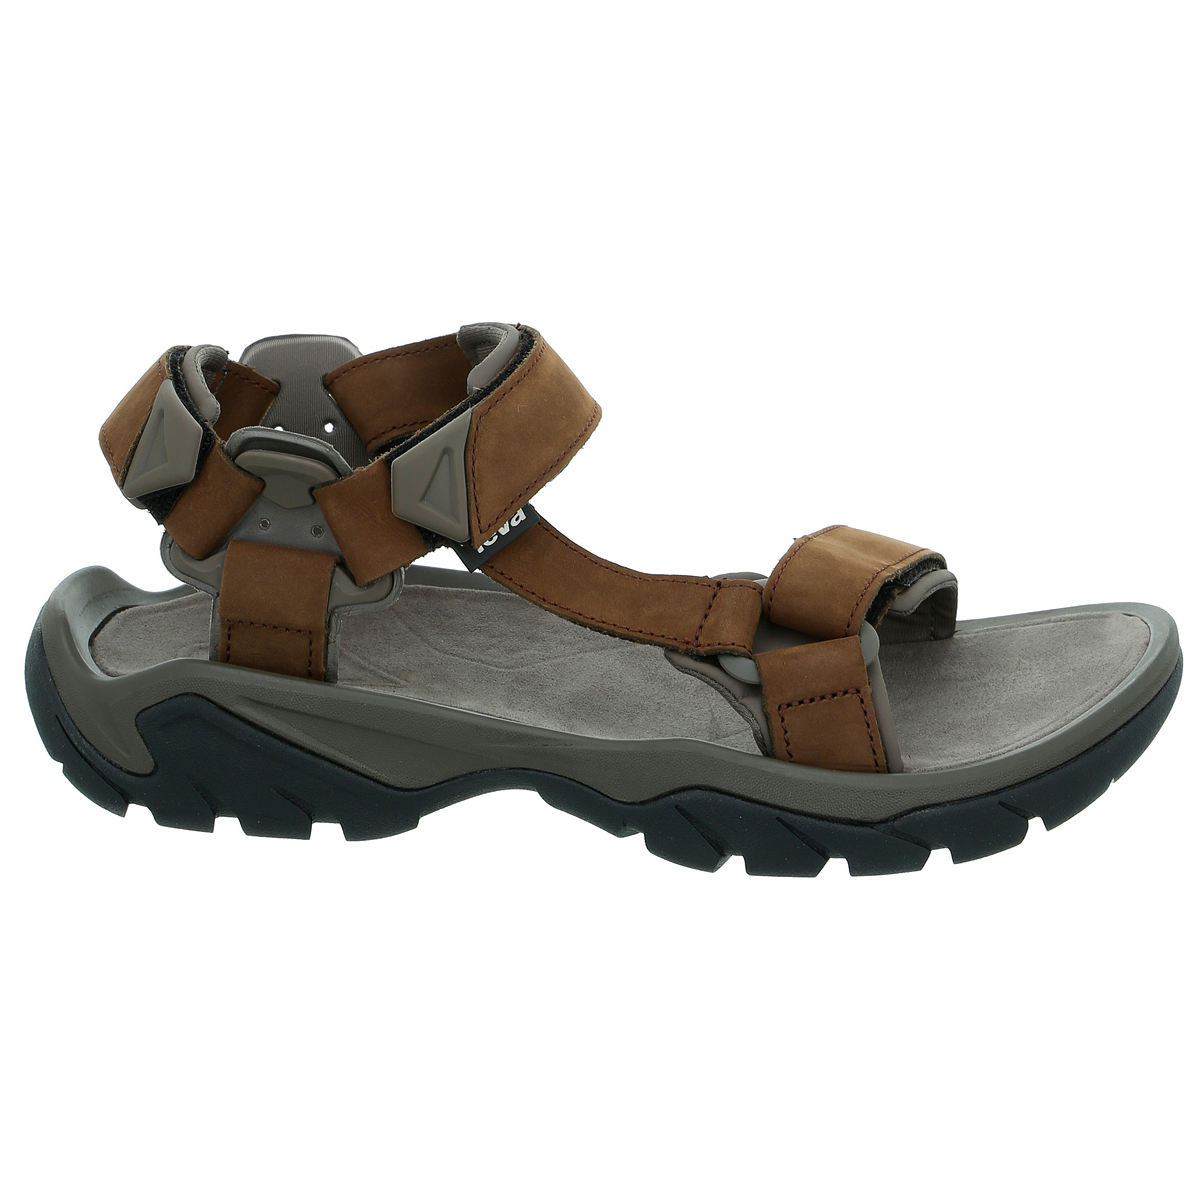 d4894ddf437a Teva Terra Fi 5 Universal Leather - Sandals Men s